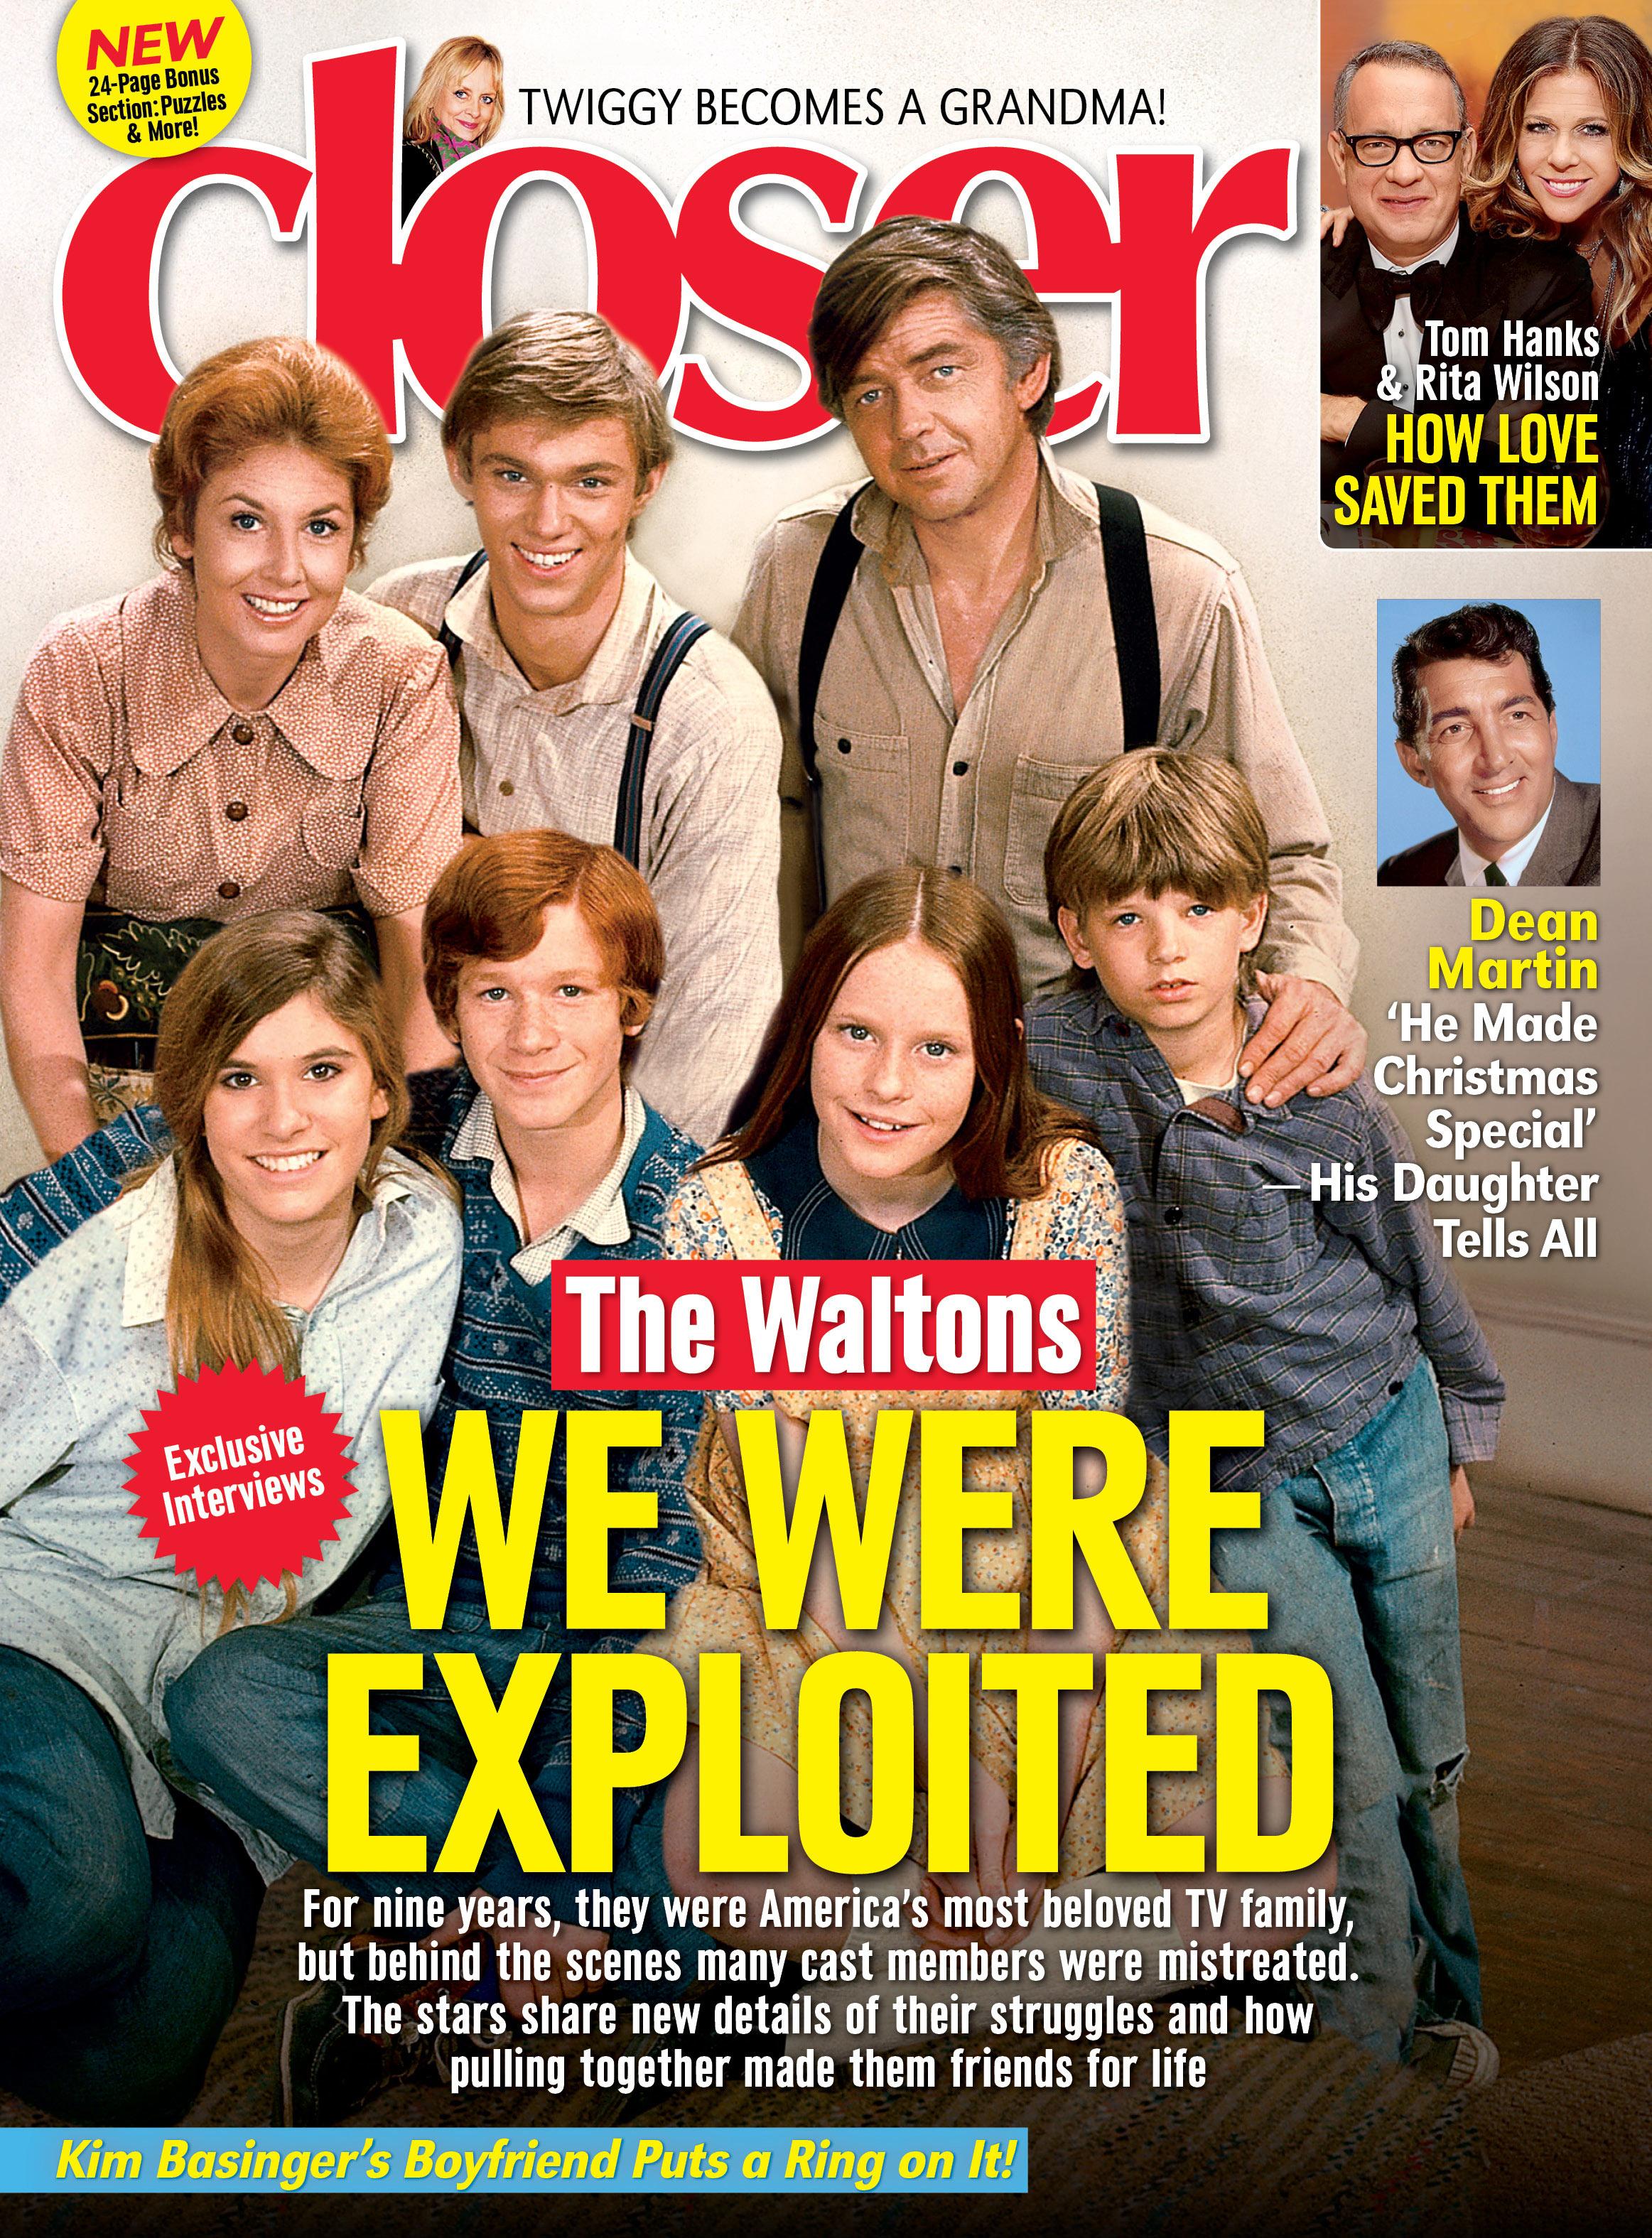 The Waltons #5